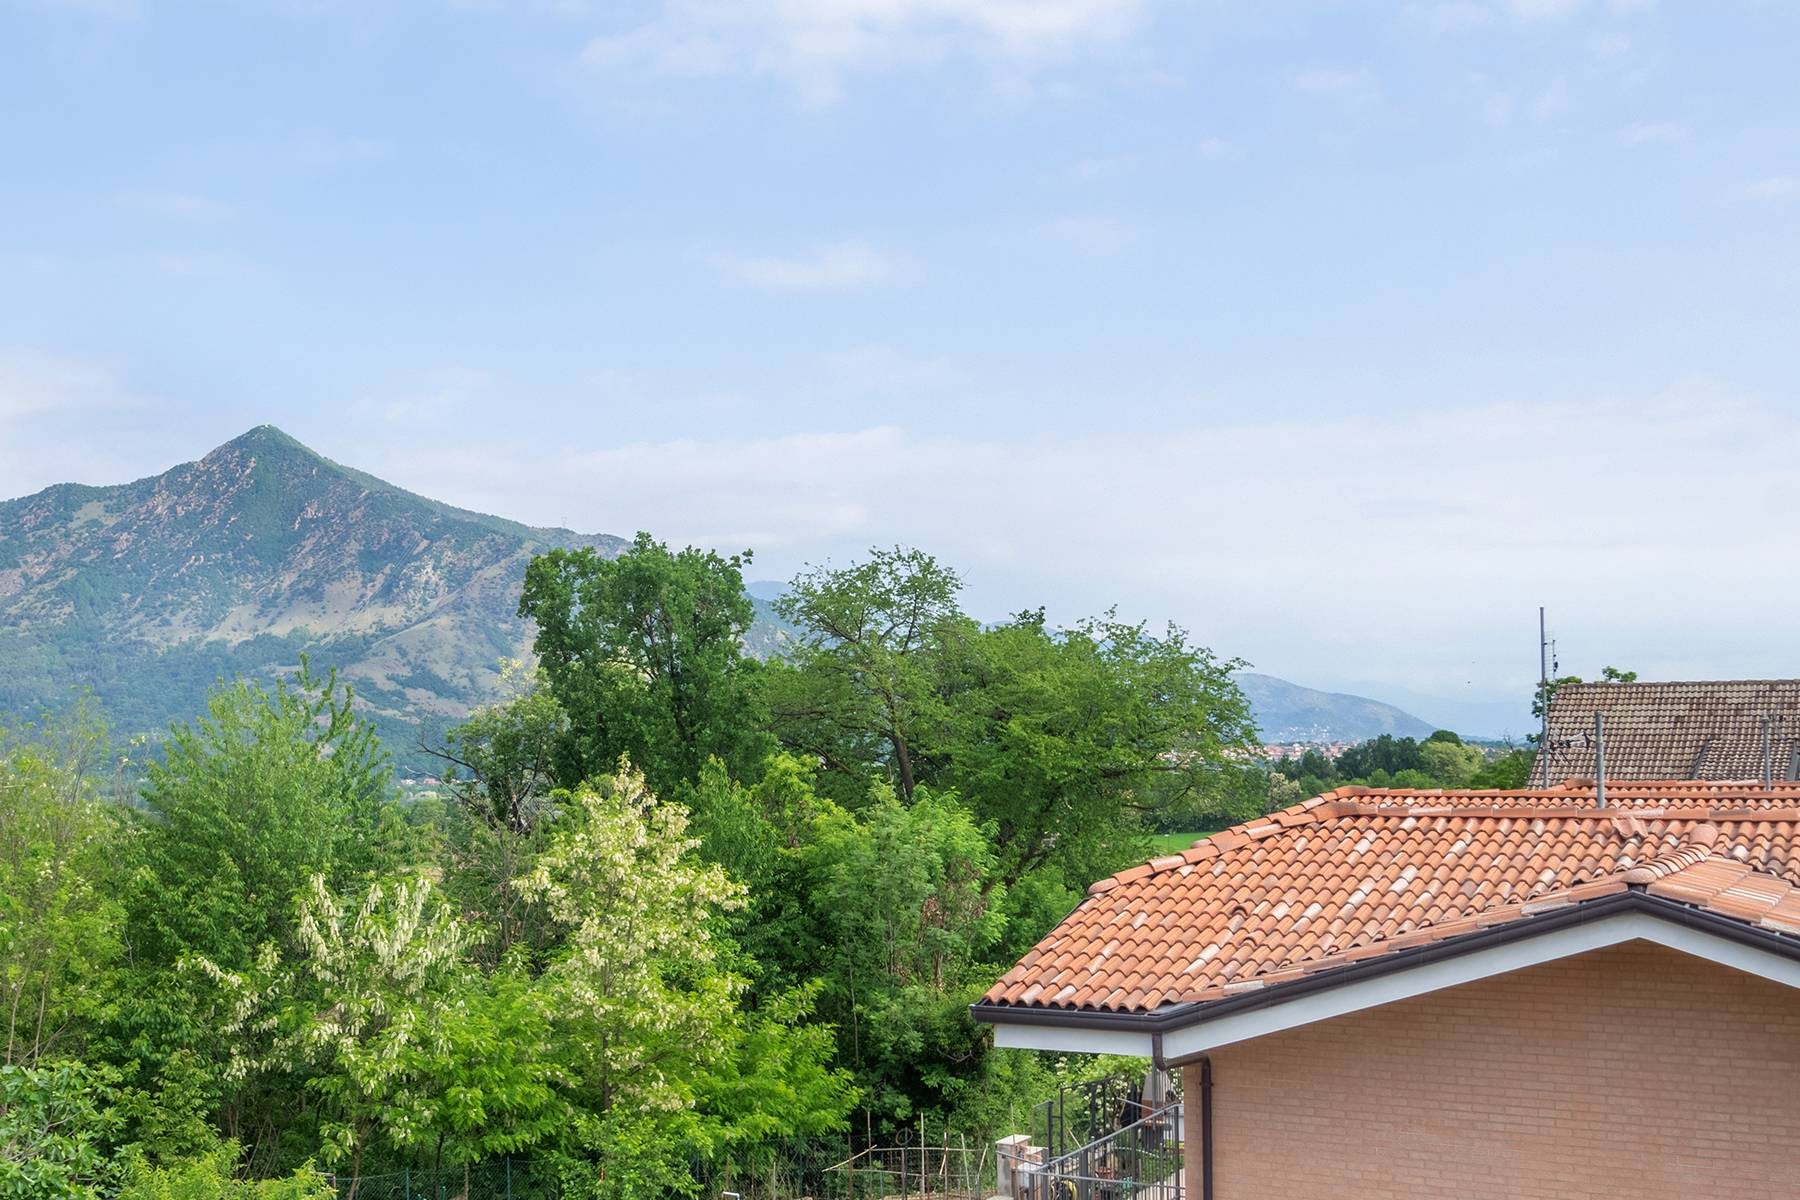 Villa in Vendita a Rosta: 5 locali, 182 mq - Foto 20